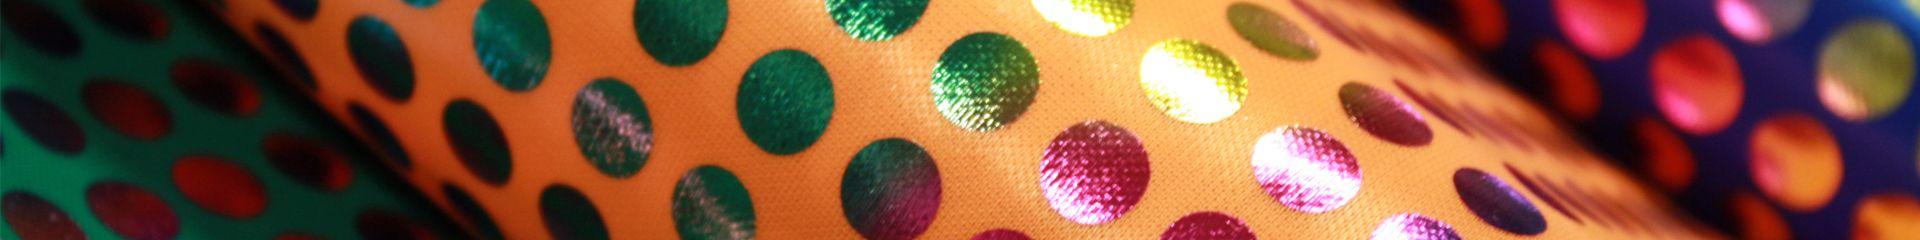 Karneval party bling